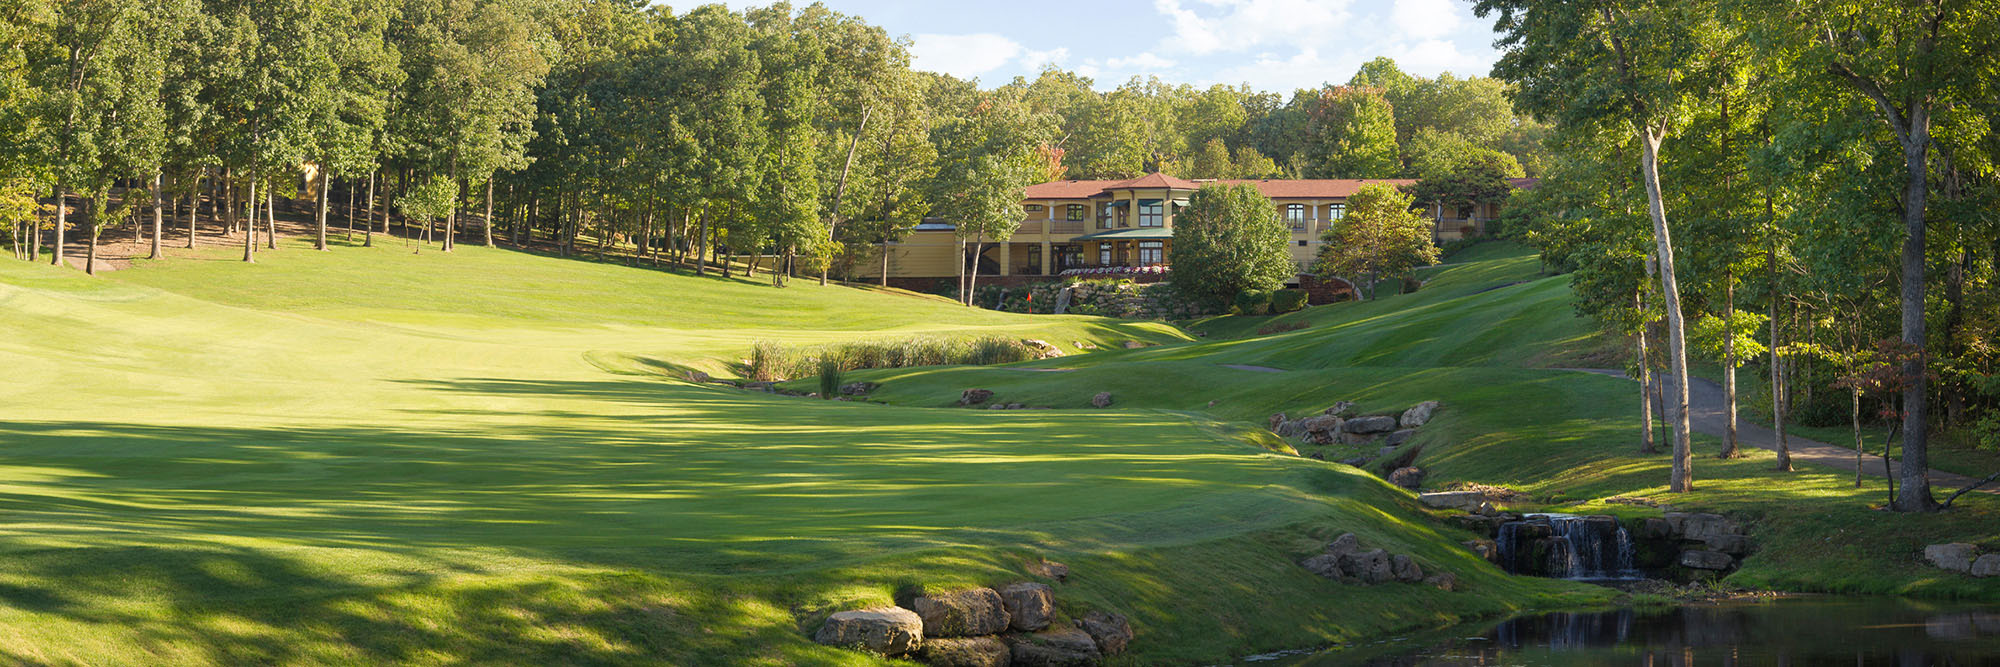 Golf Course Image - The Club at Porto Cima No. 18